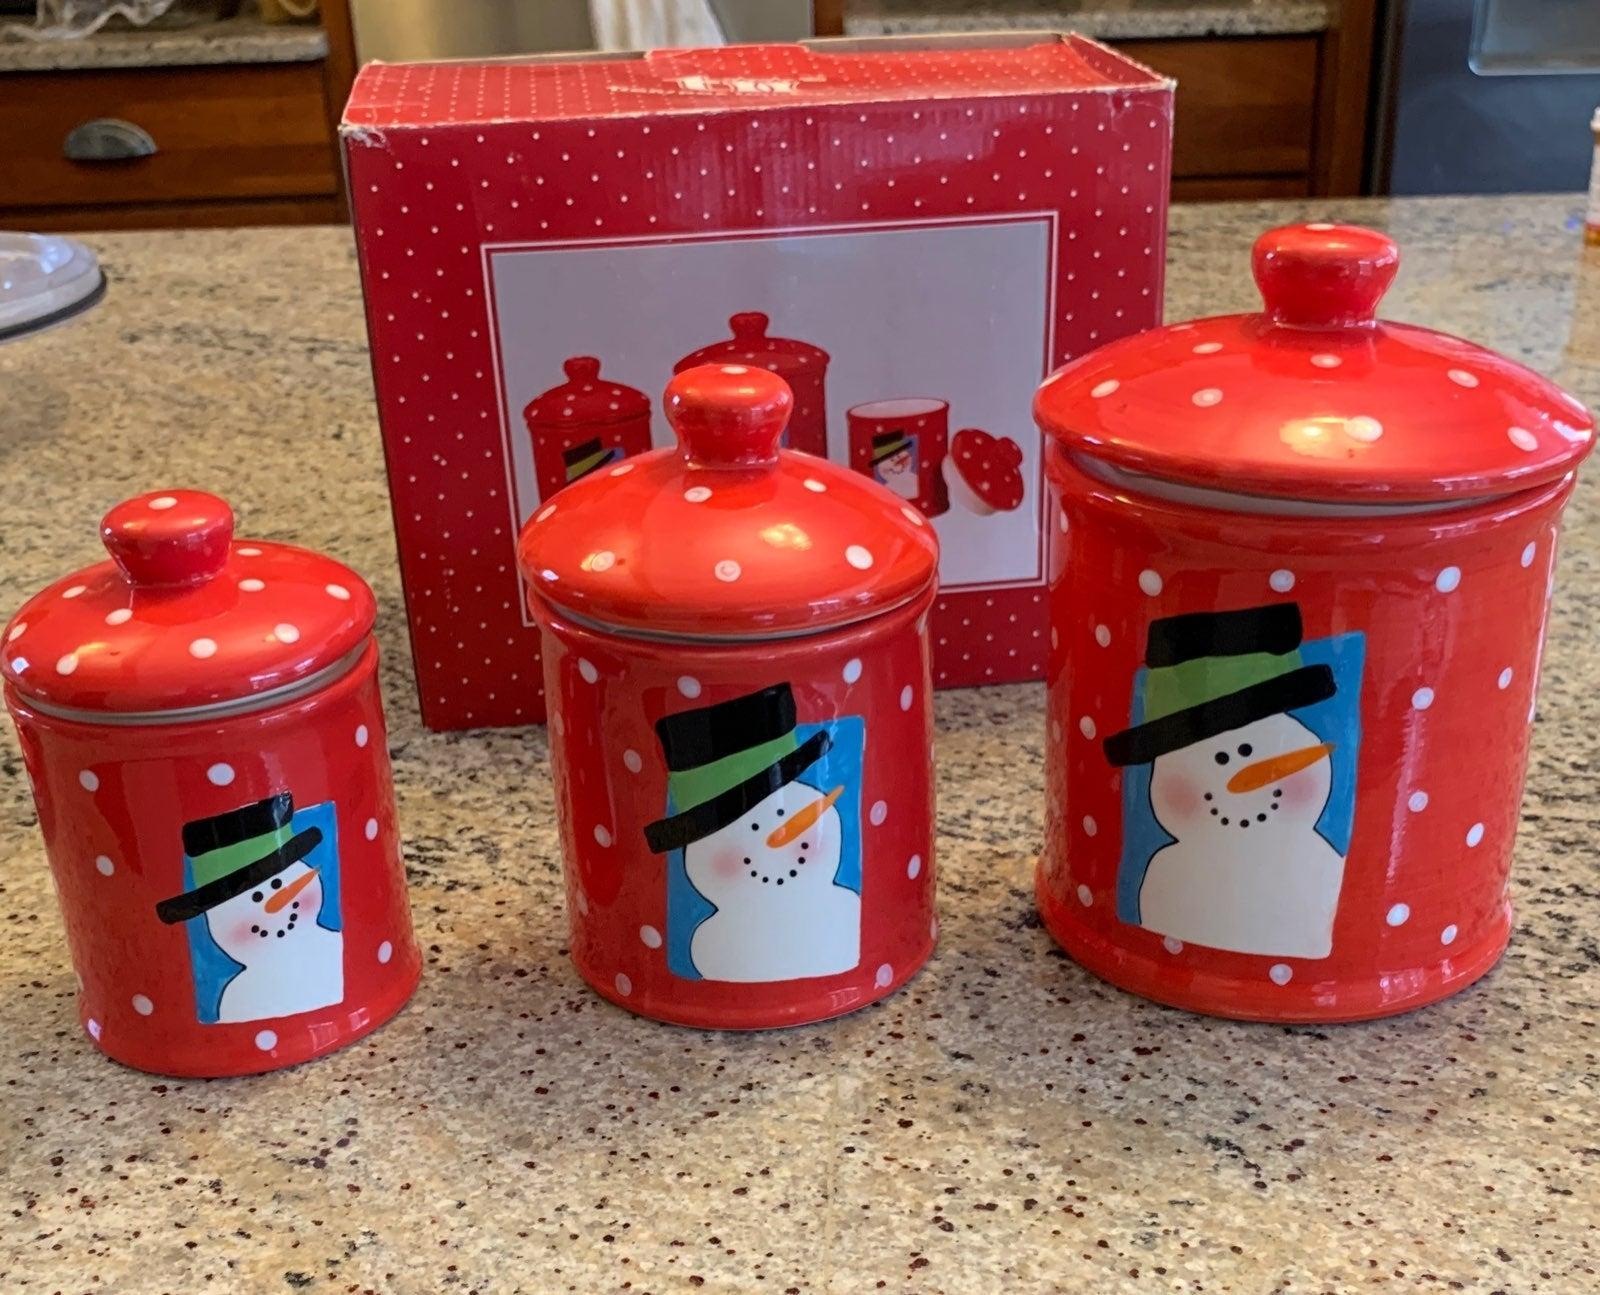 Snowman polka dot canister - set of 3